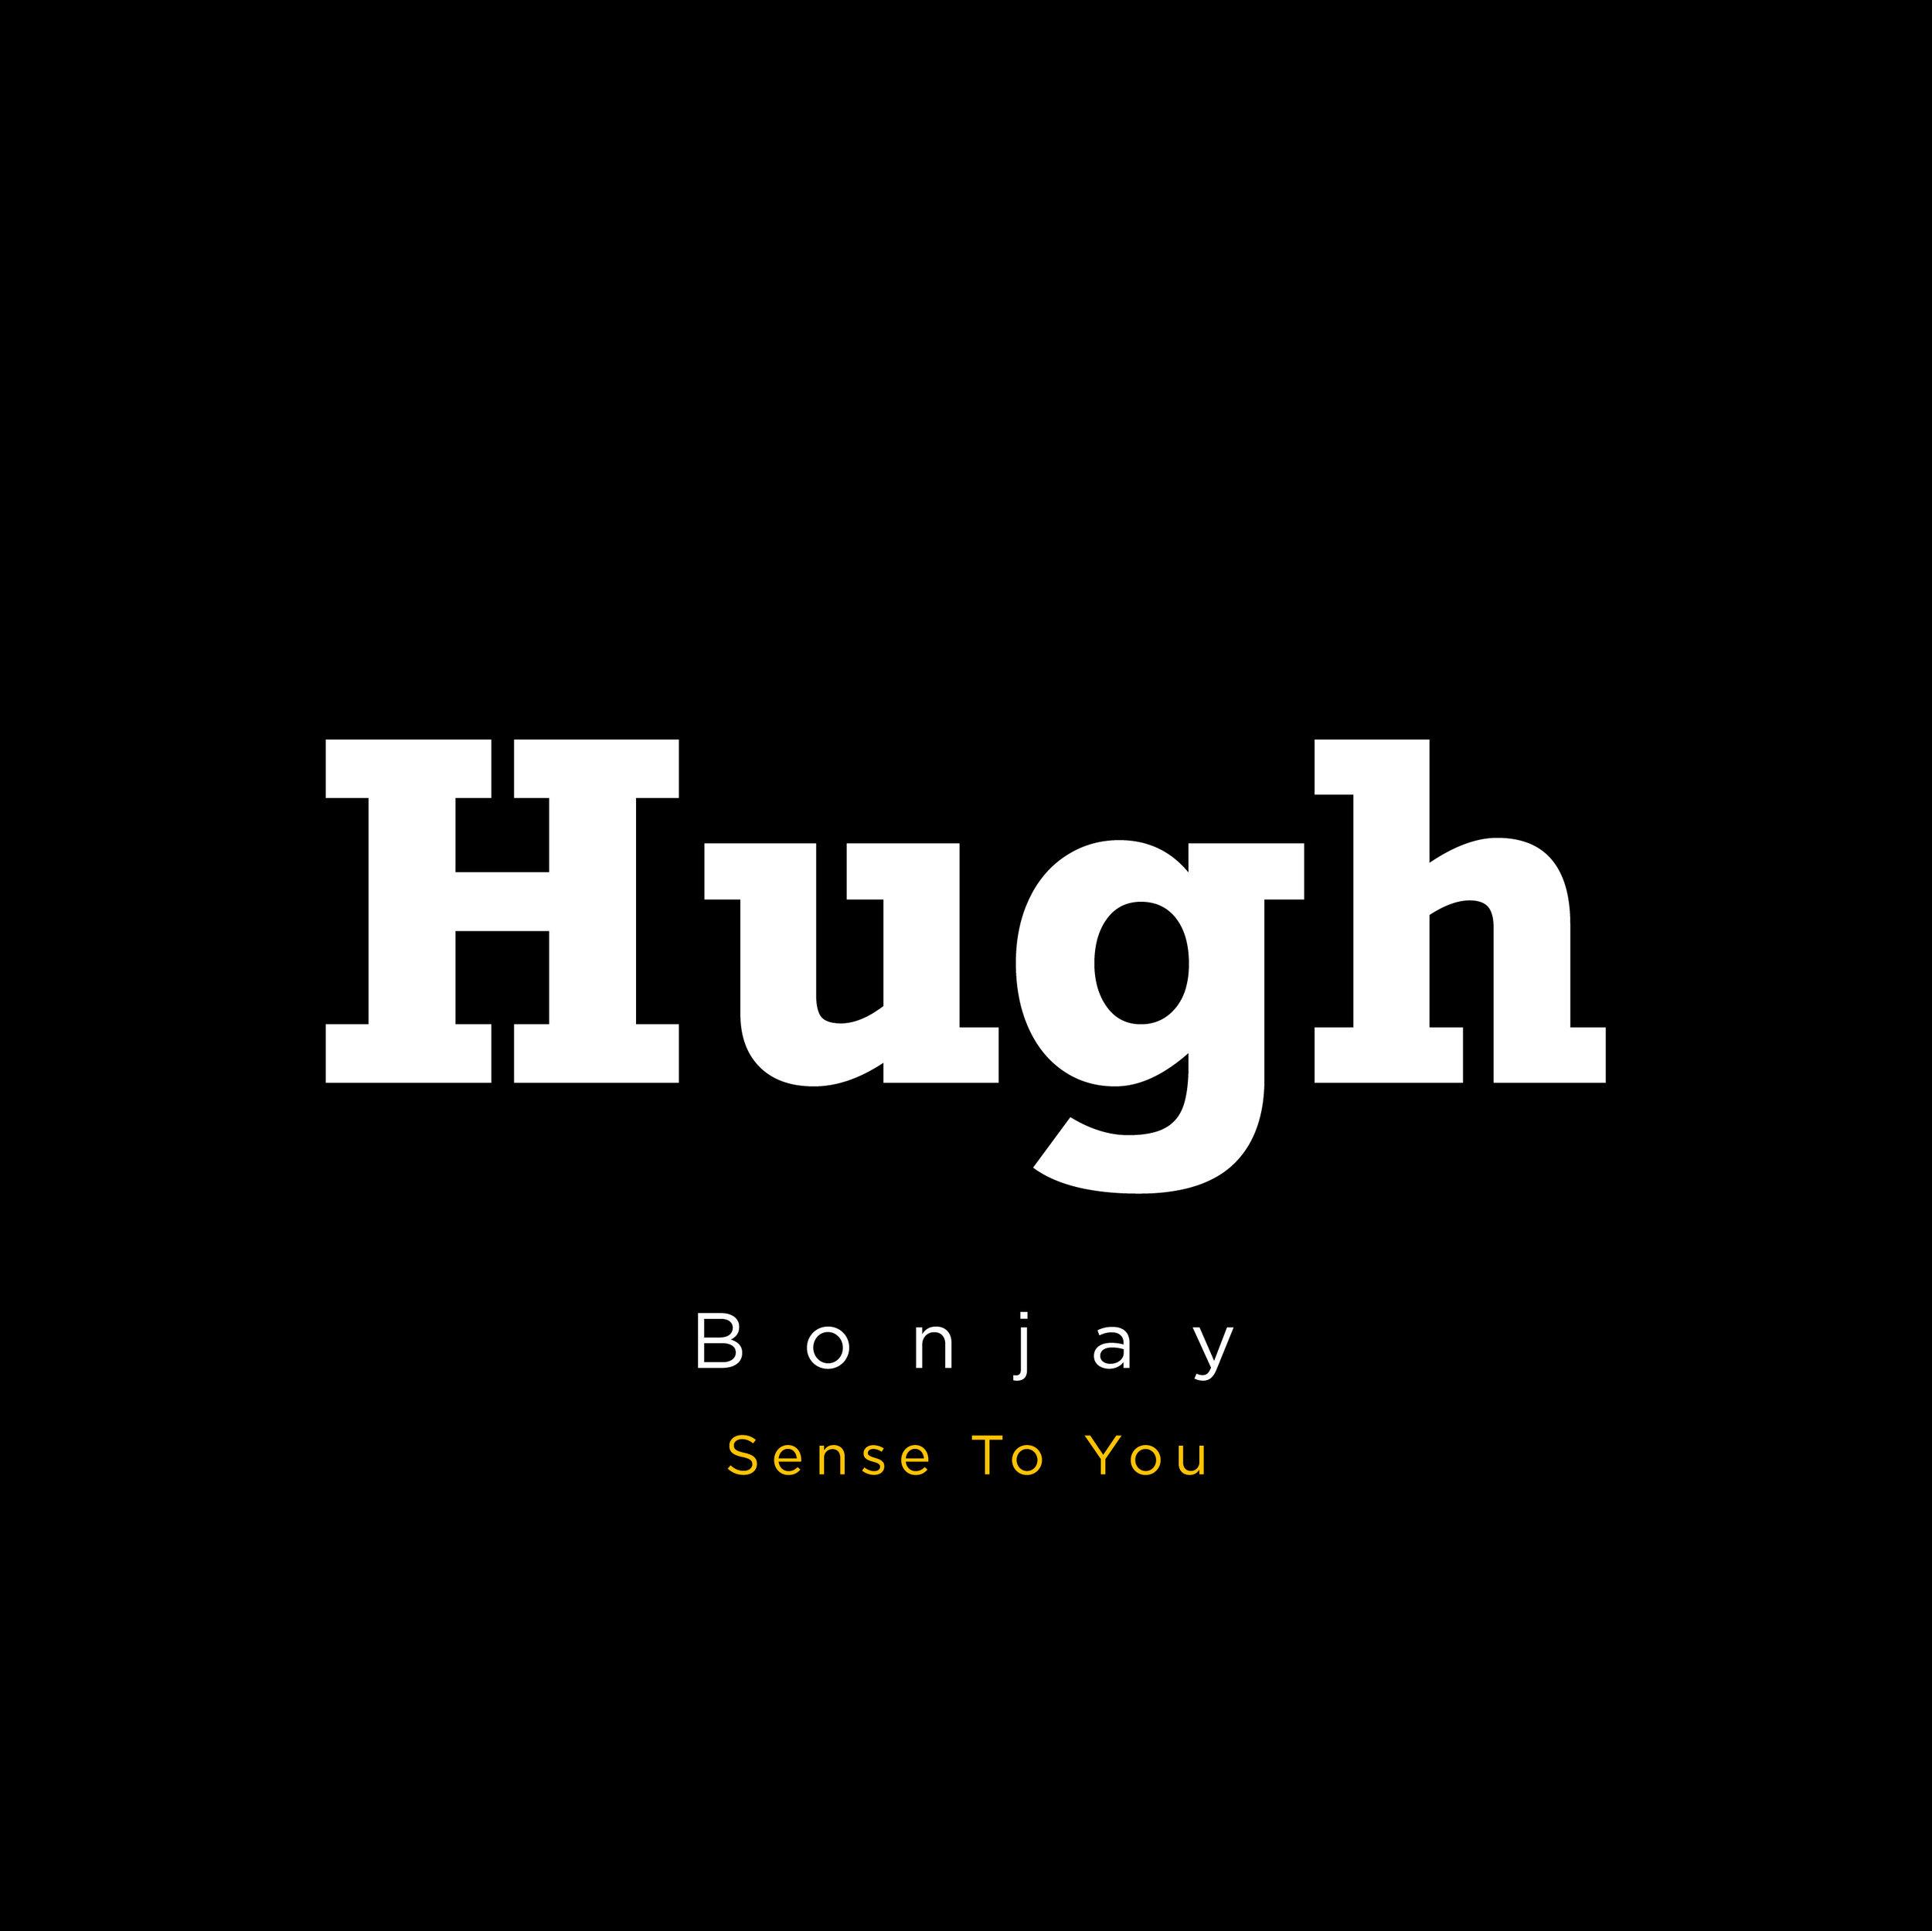 Hugh-02.jpg